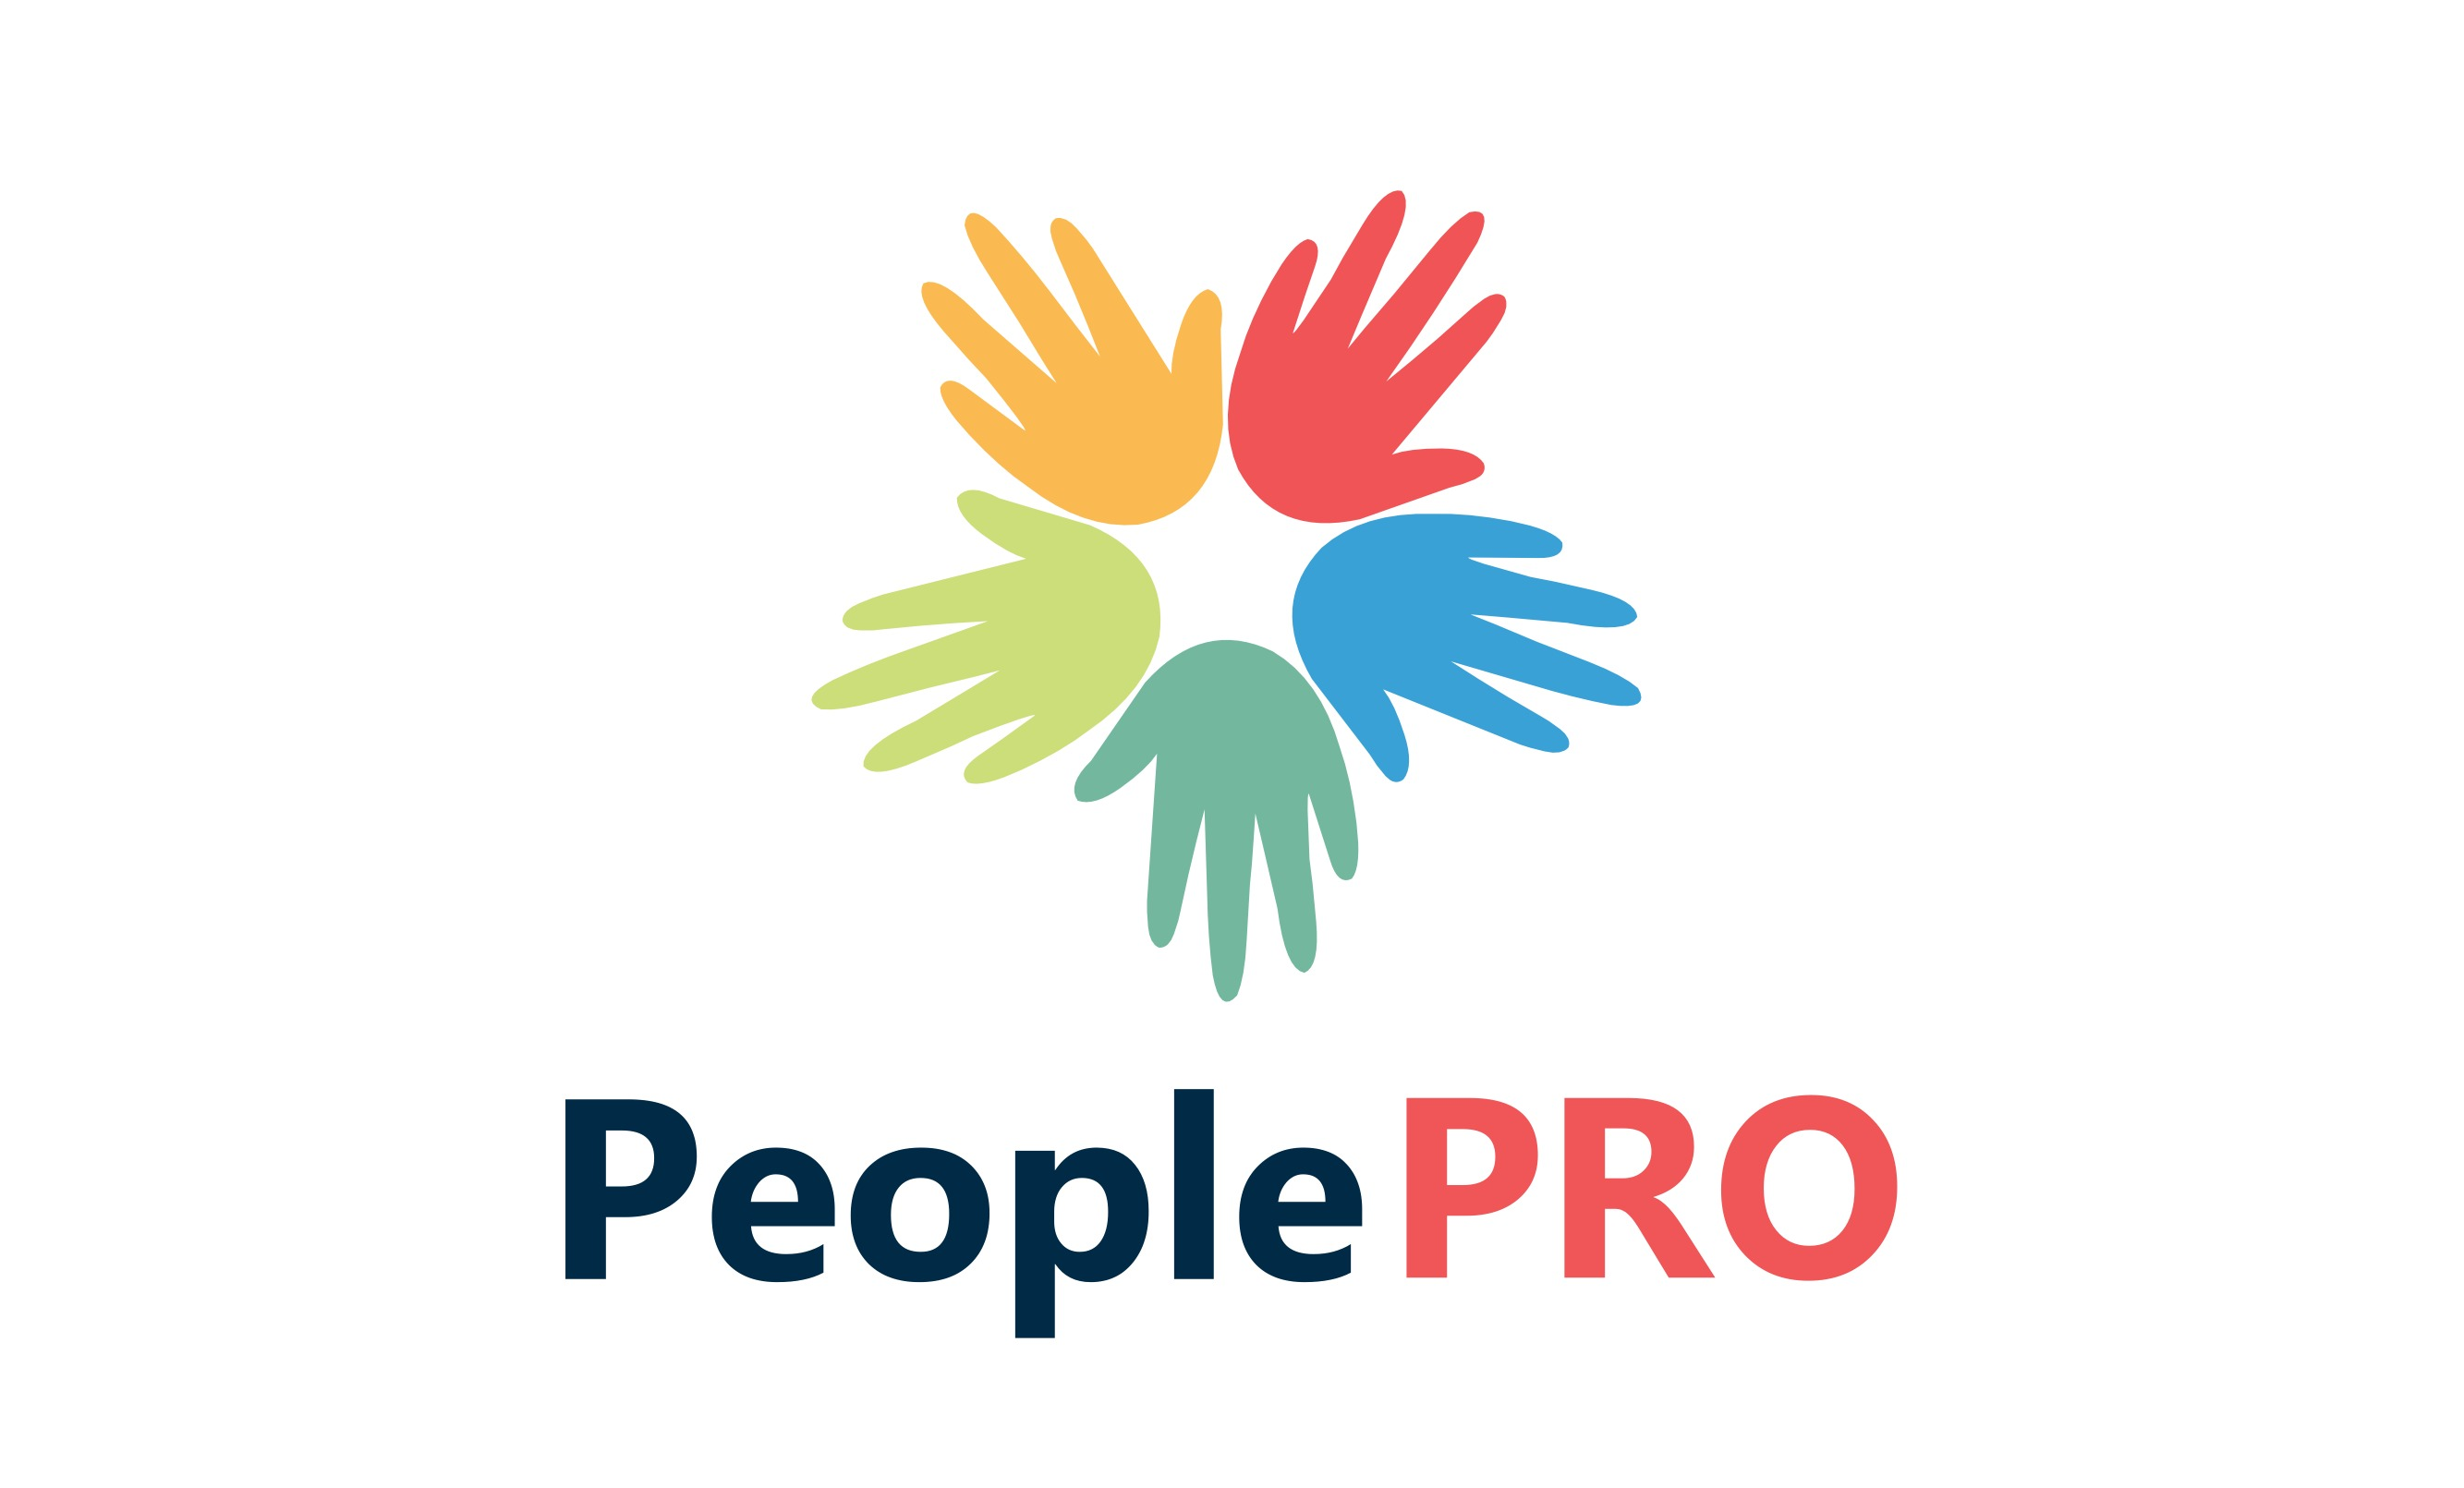 Empresas Desafio10x: PeoplePro